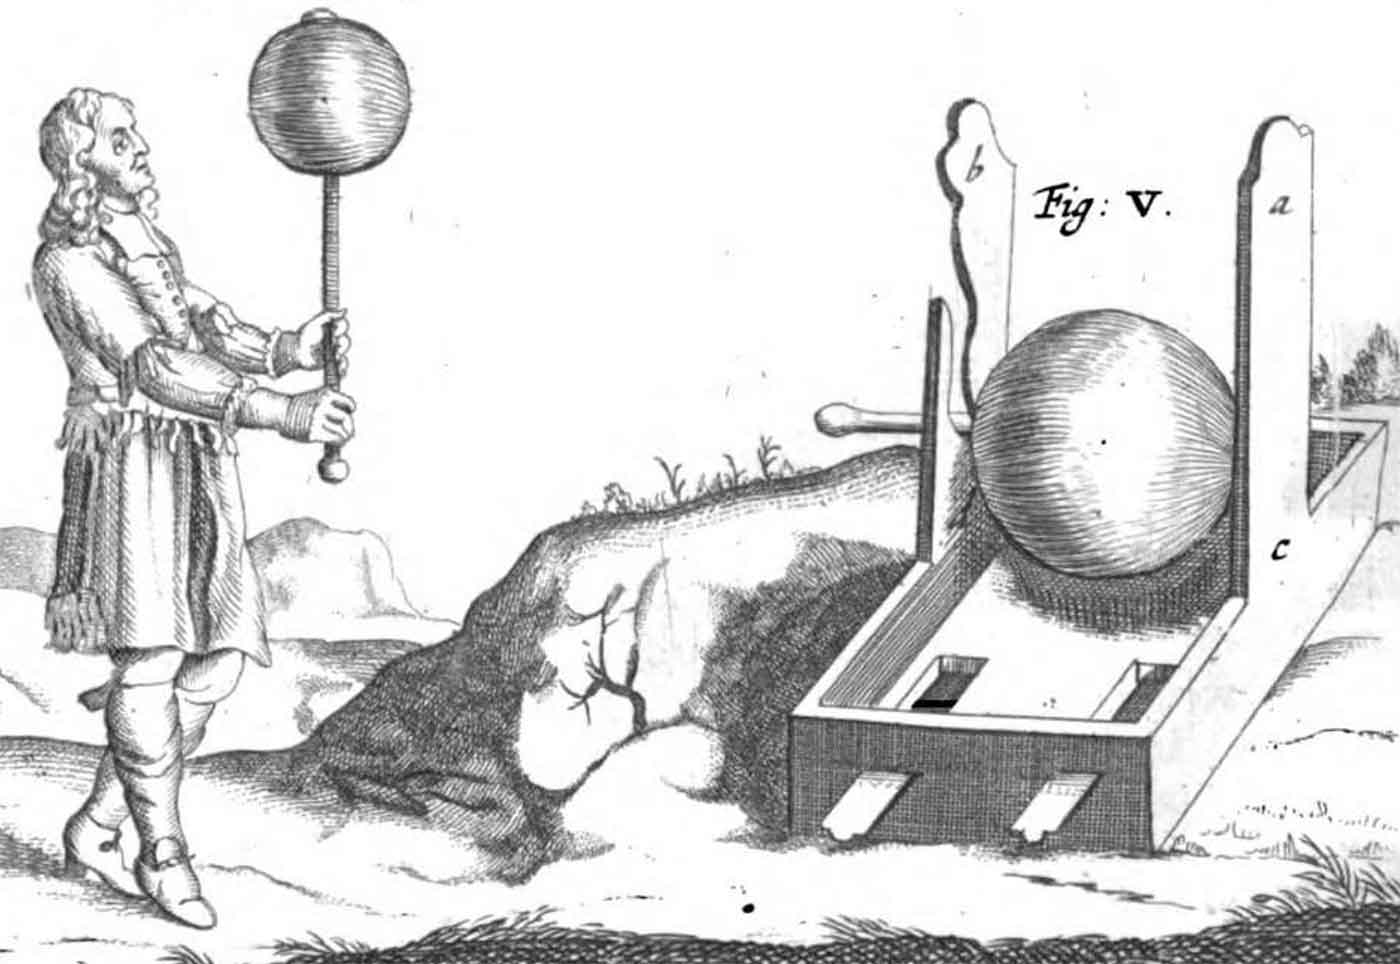 Guericke sulfur globe